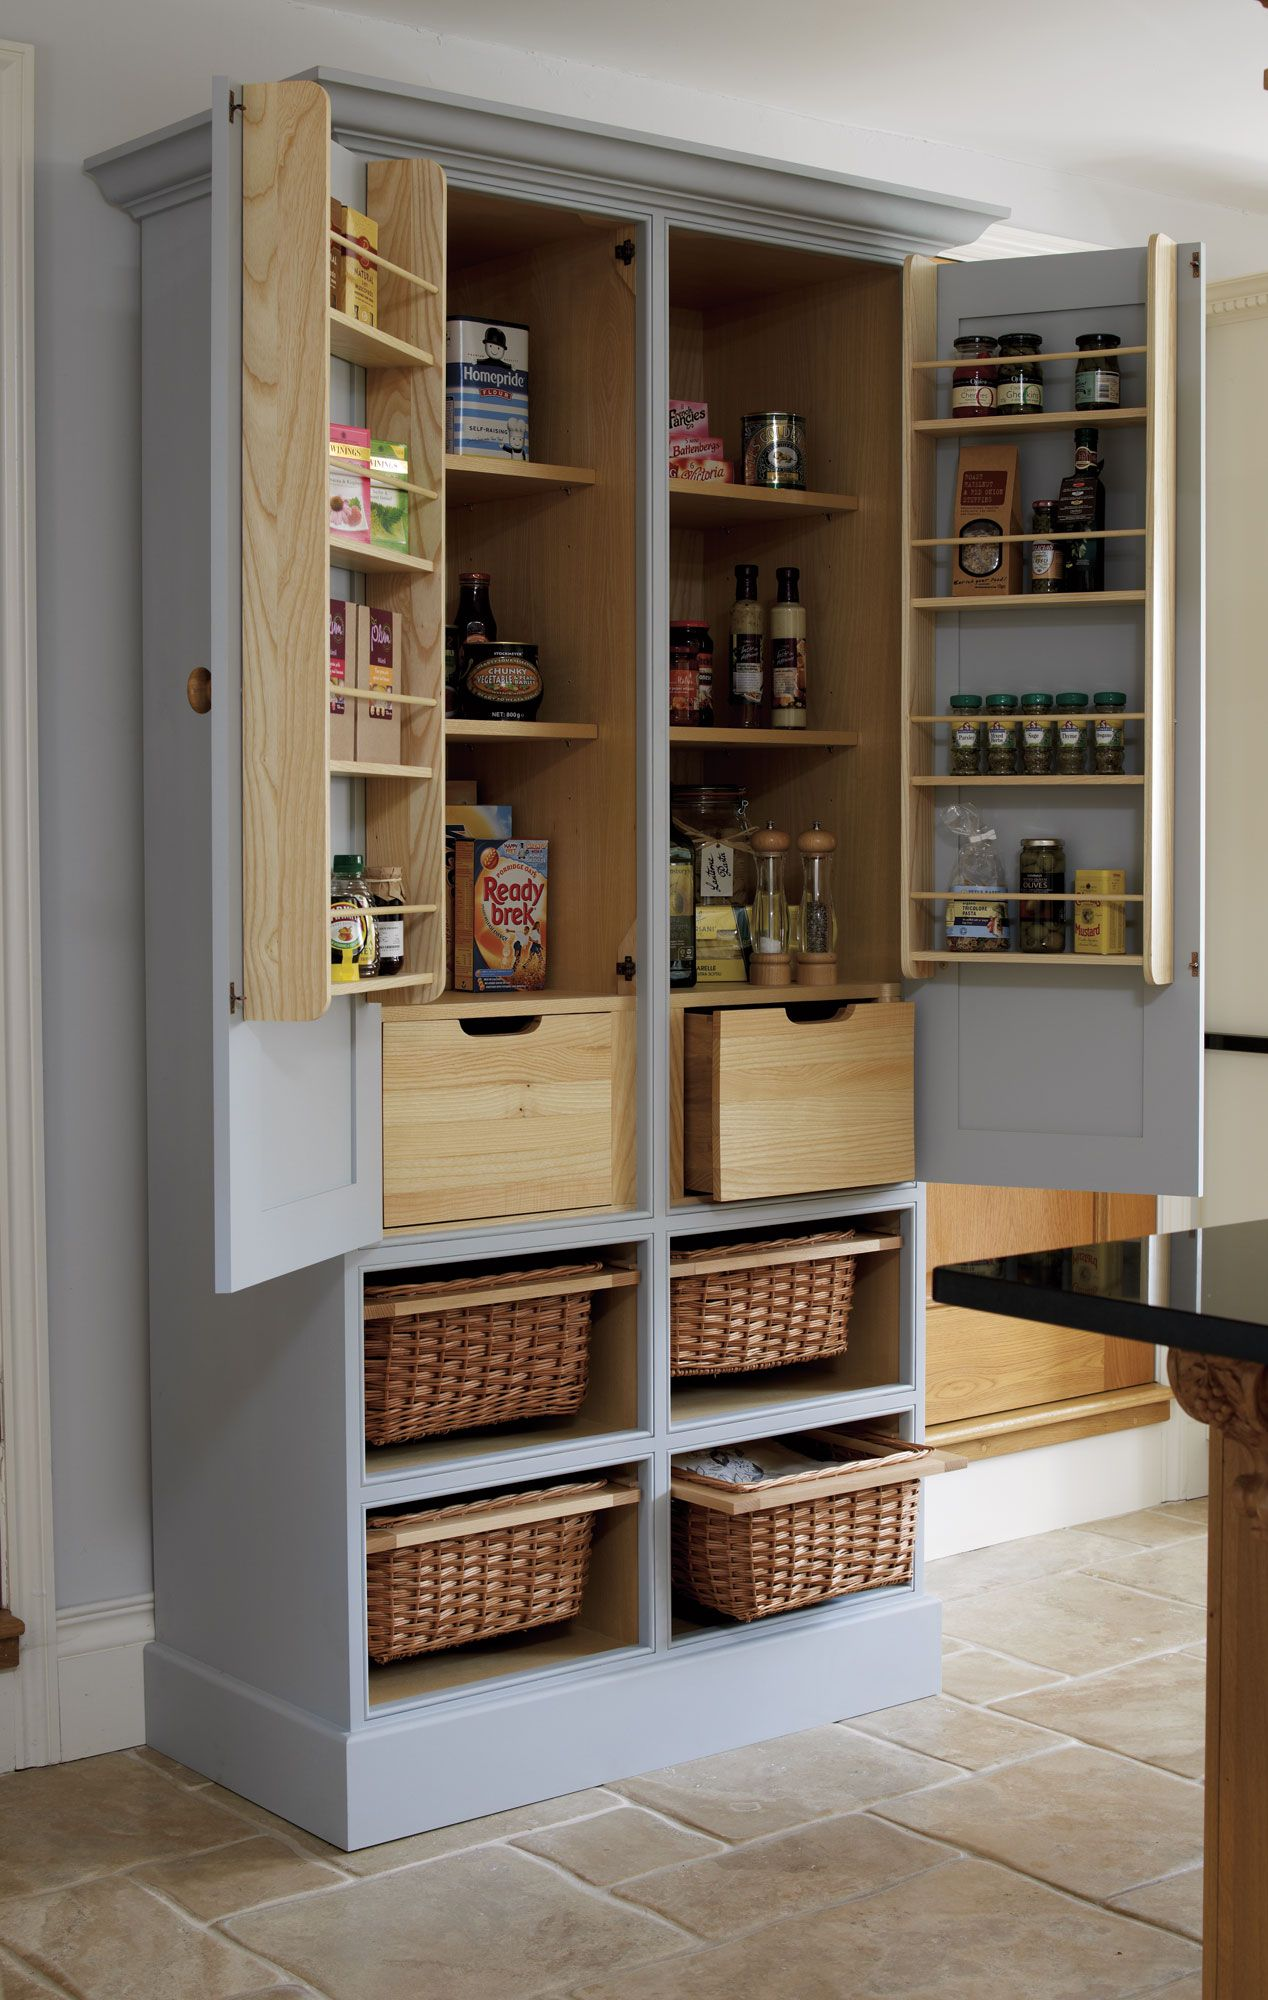 Armoire Pantry Kitchen Diy Storage Cabinet Furniture